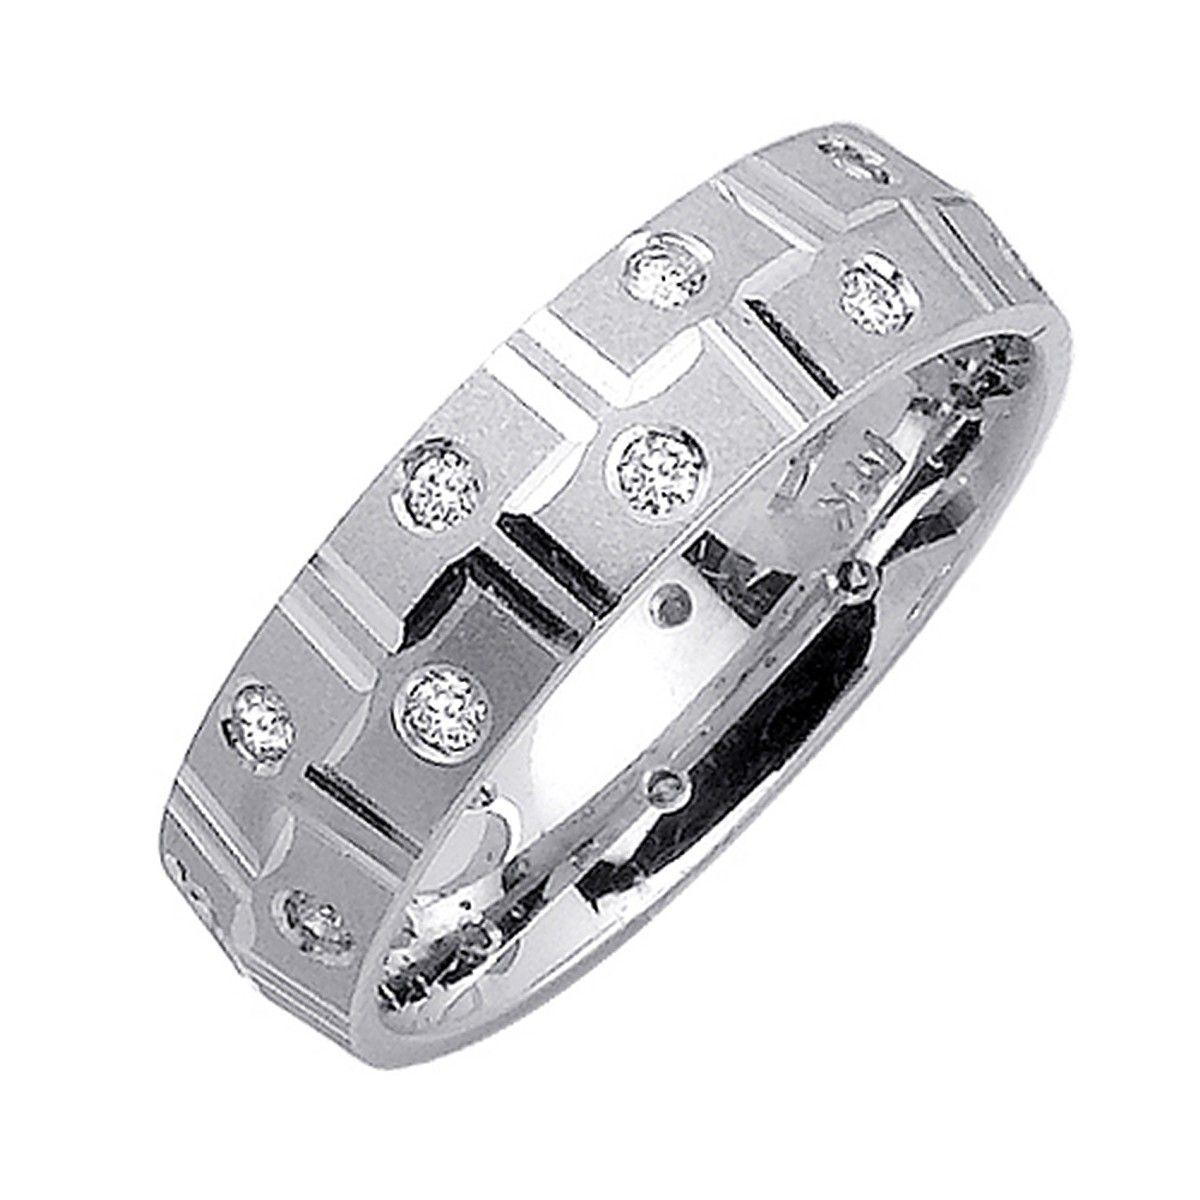 6mm 14k white gold mens diamond ring 40ct from